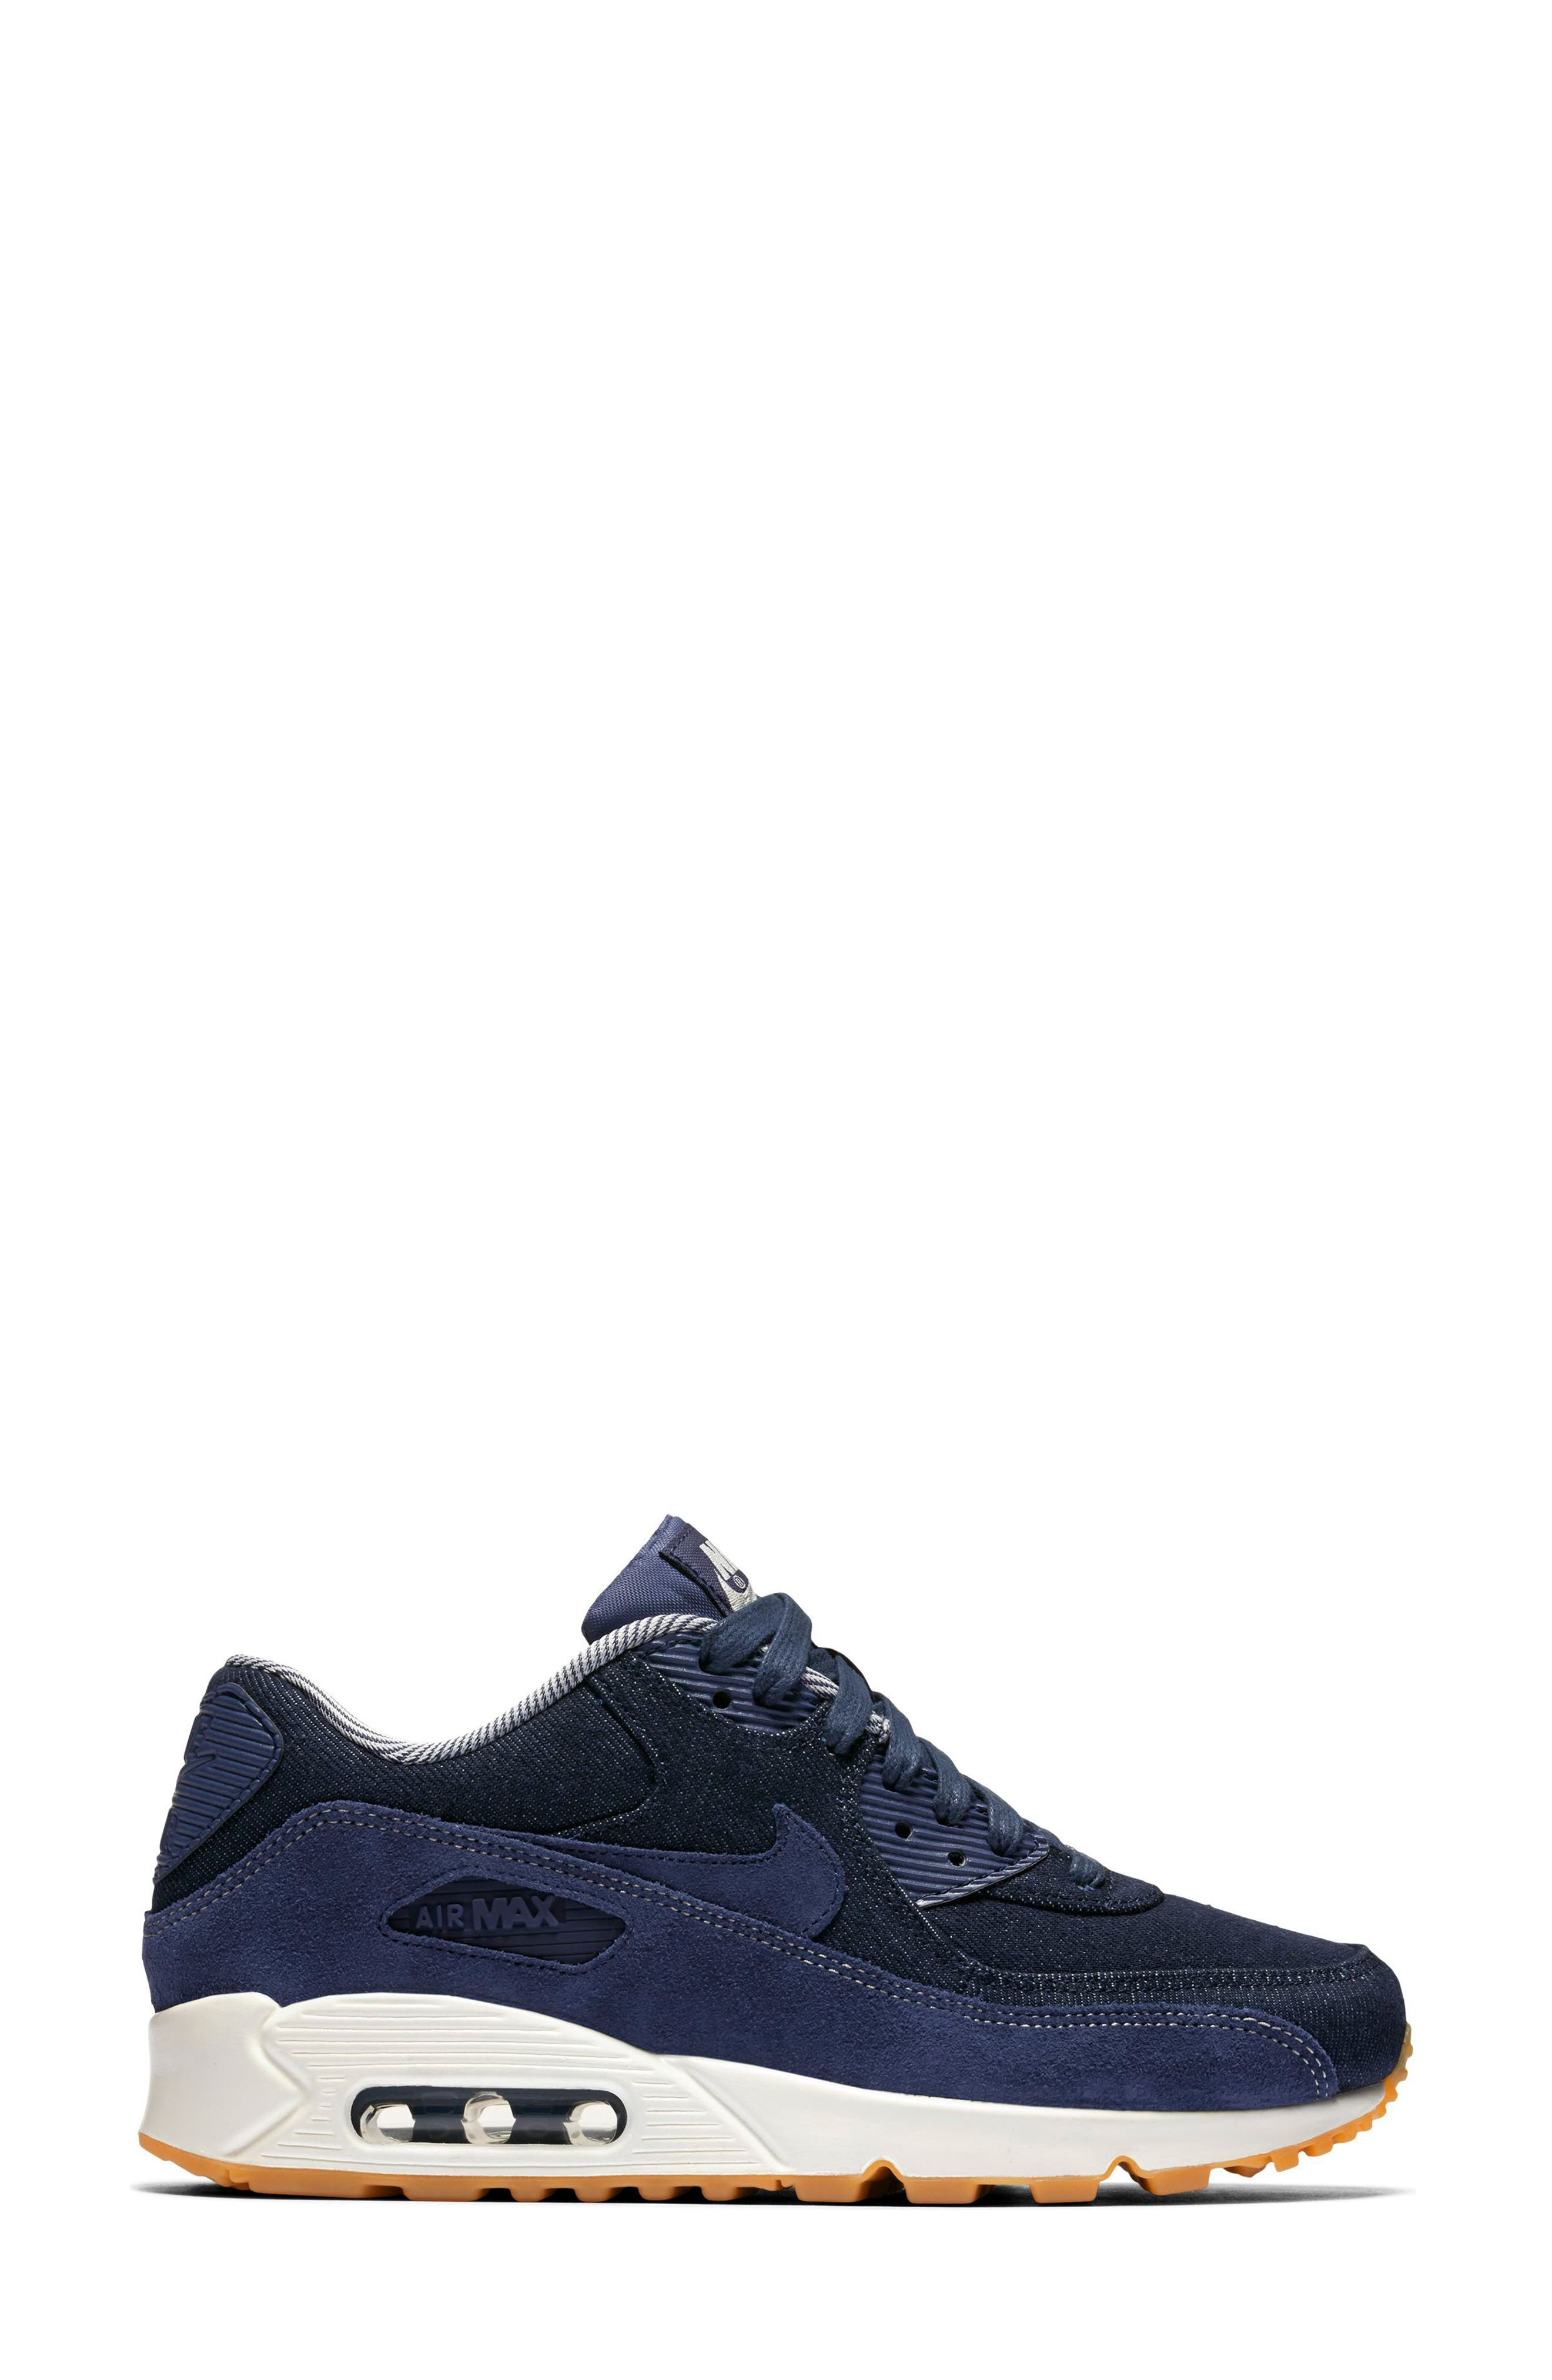 Air Max 90 SE Sneaker,                             Alternate thumbnail 25, color,